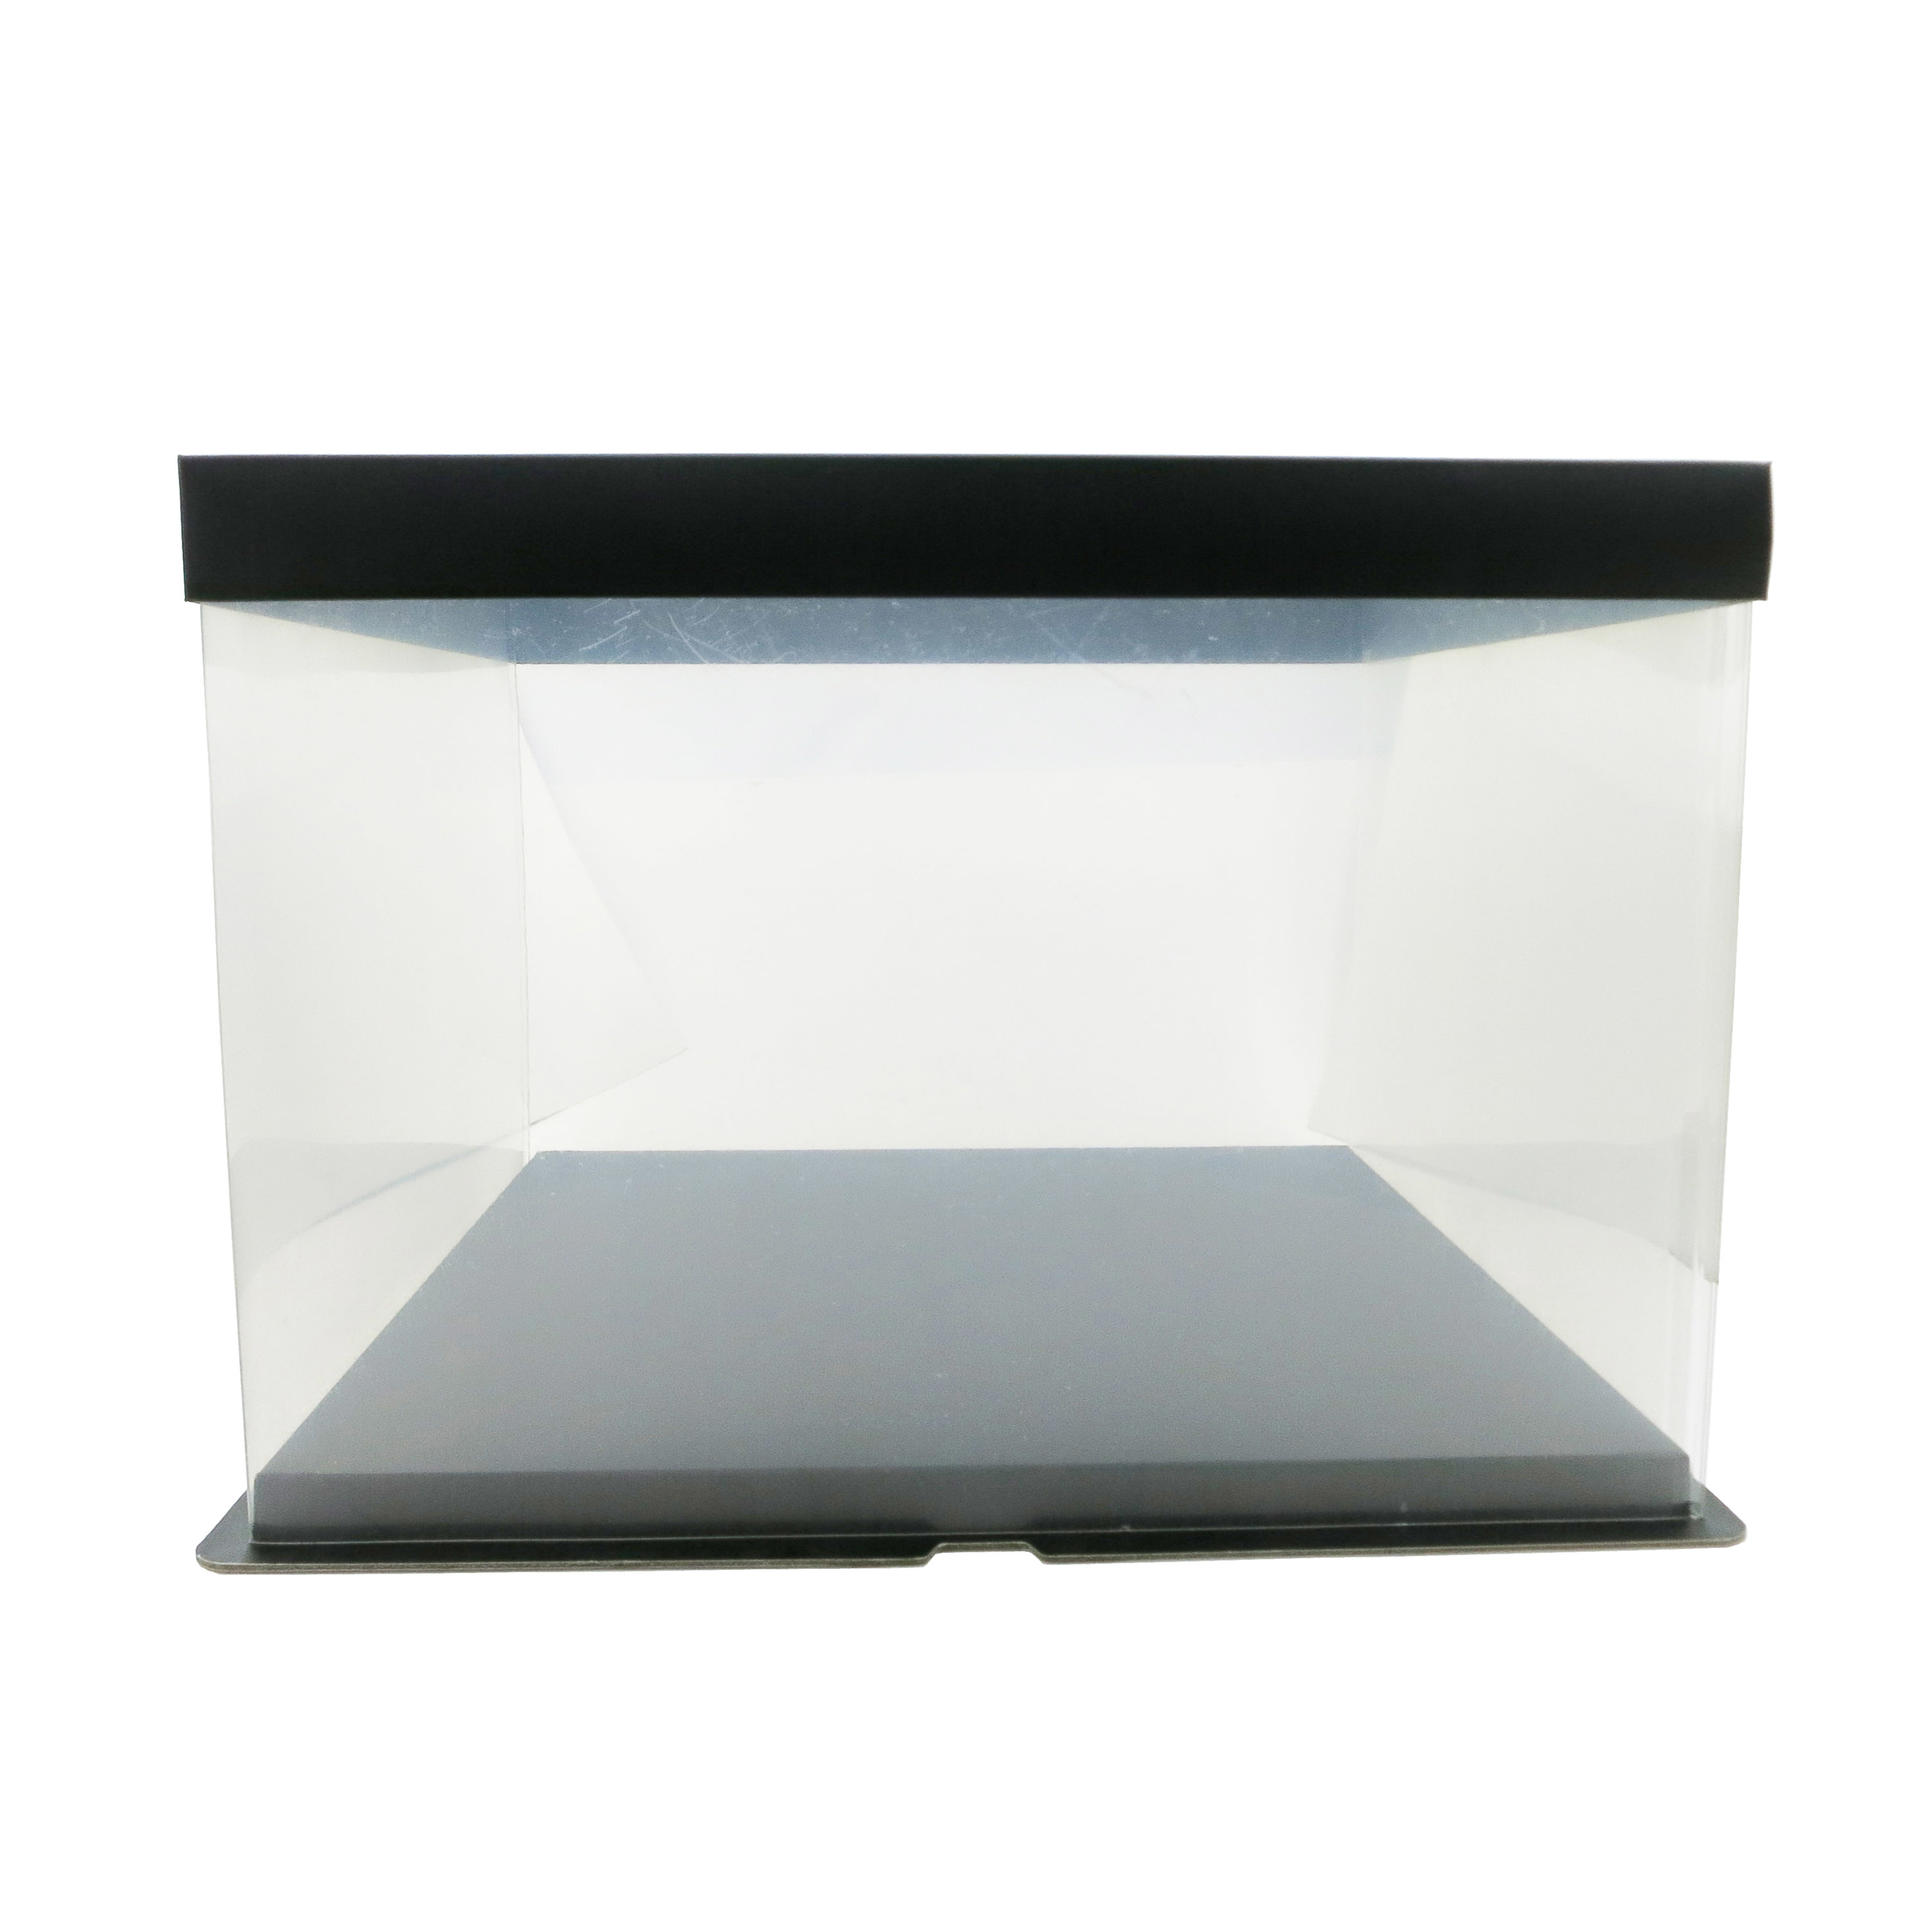 Food Grade PET Plastic Cake Box for 12